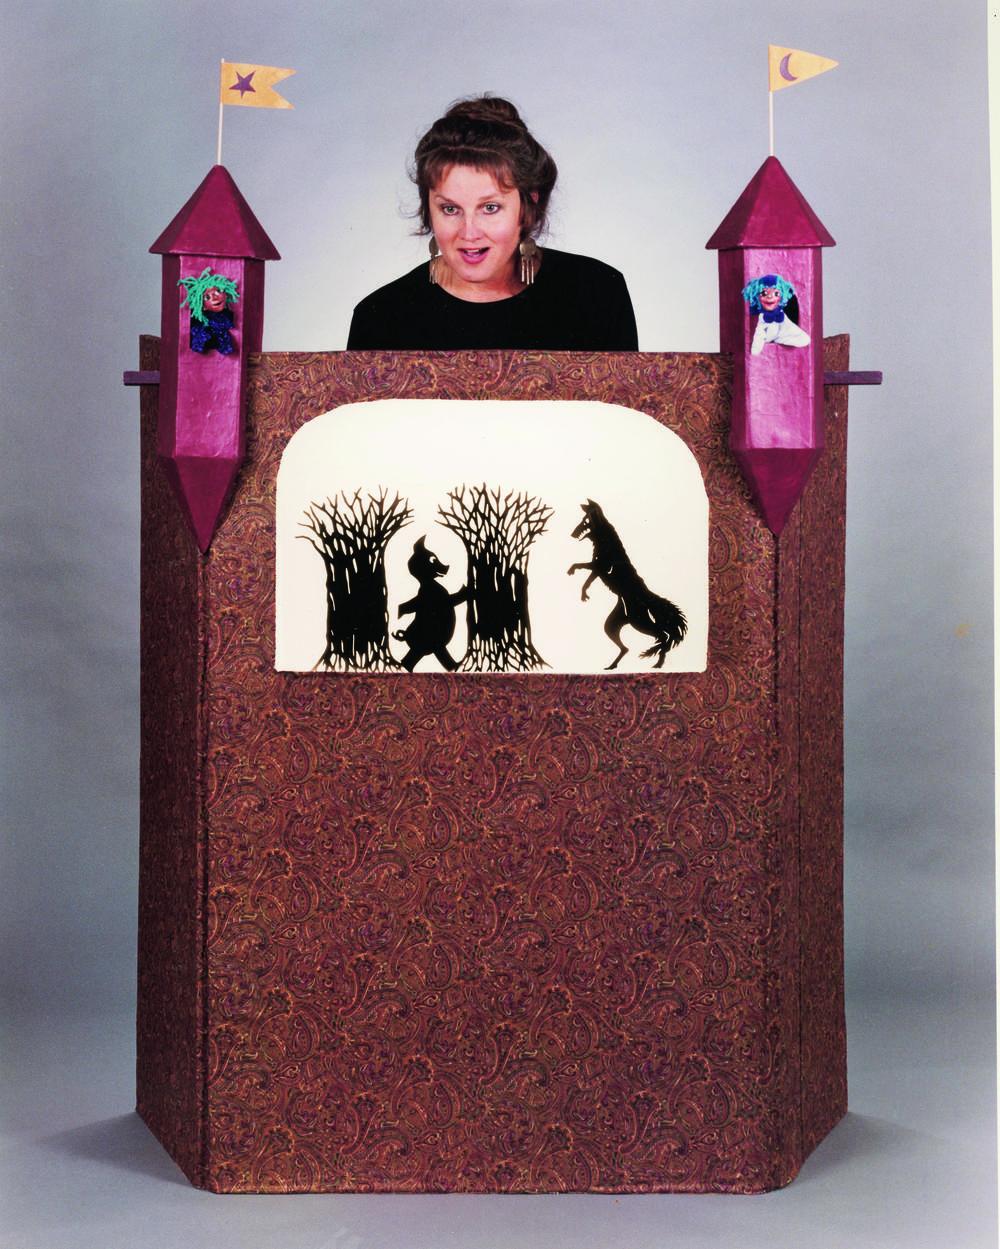 Deborah Costine